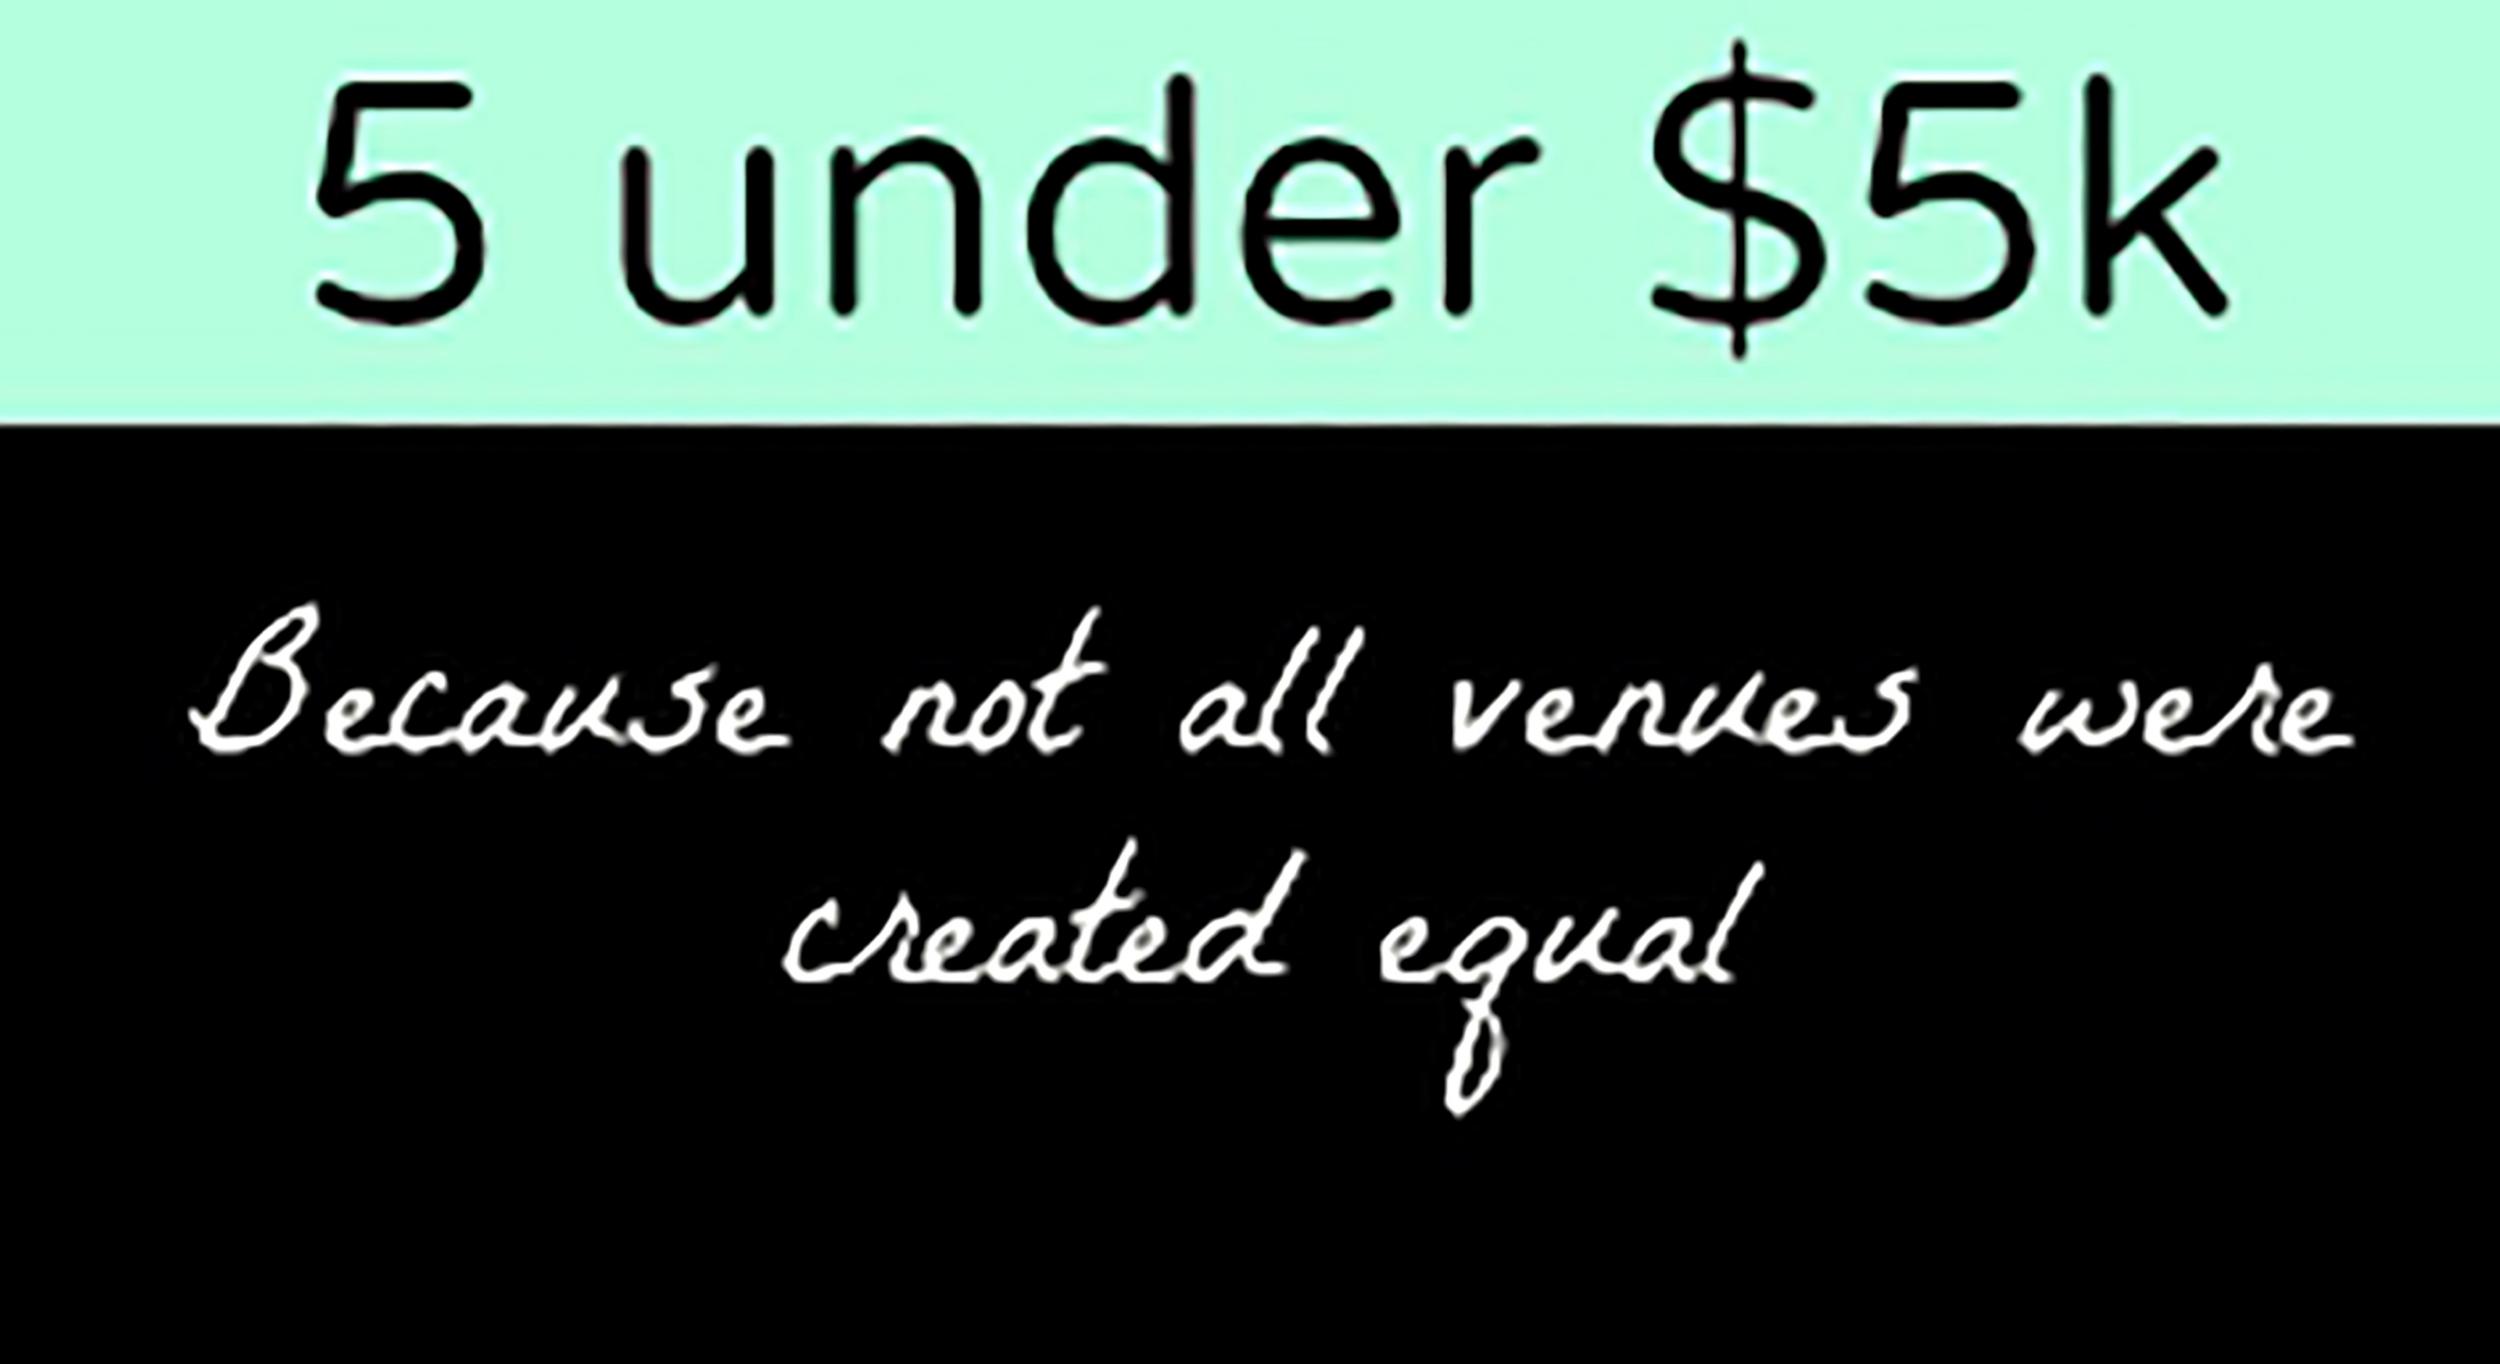 5 under $5k.jpg